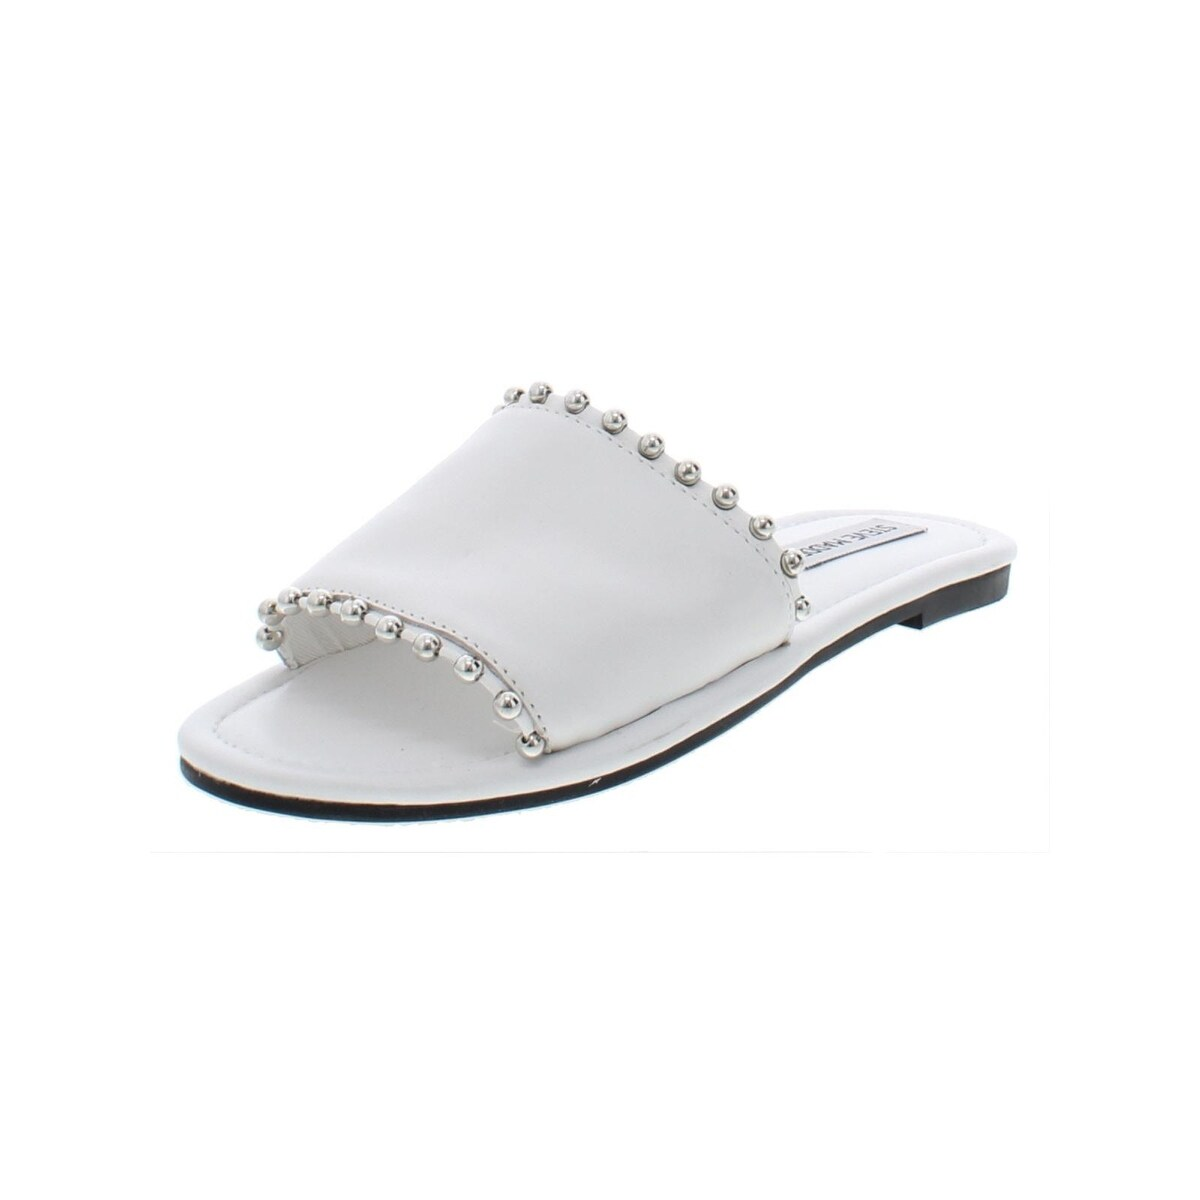 e99ff3ccebb Steve Madden Womens Brew Slide Sandals Leather Studded